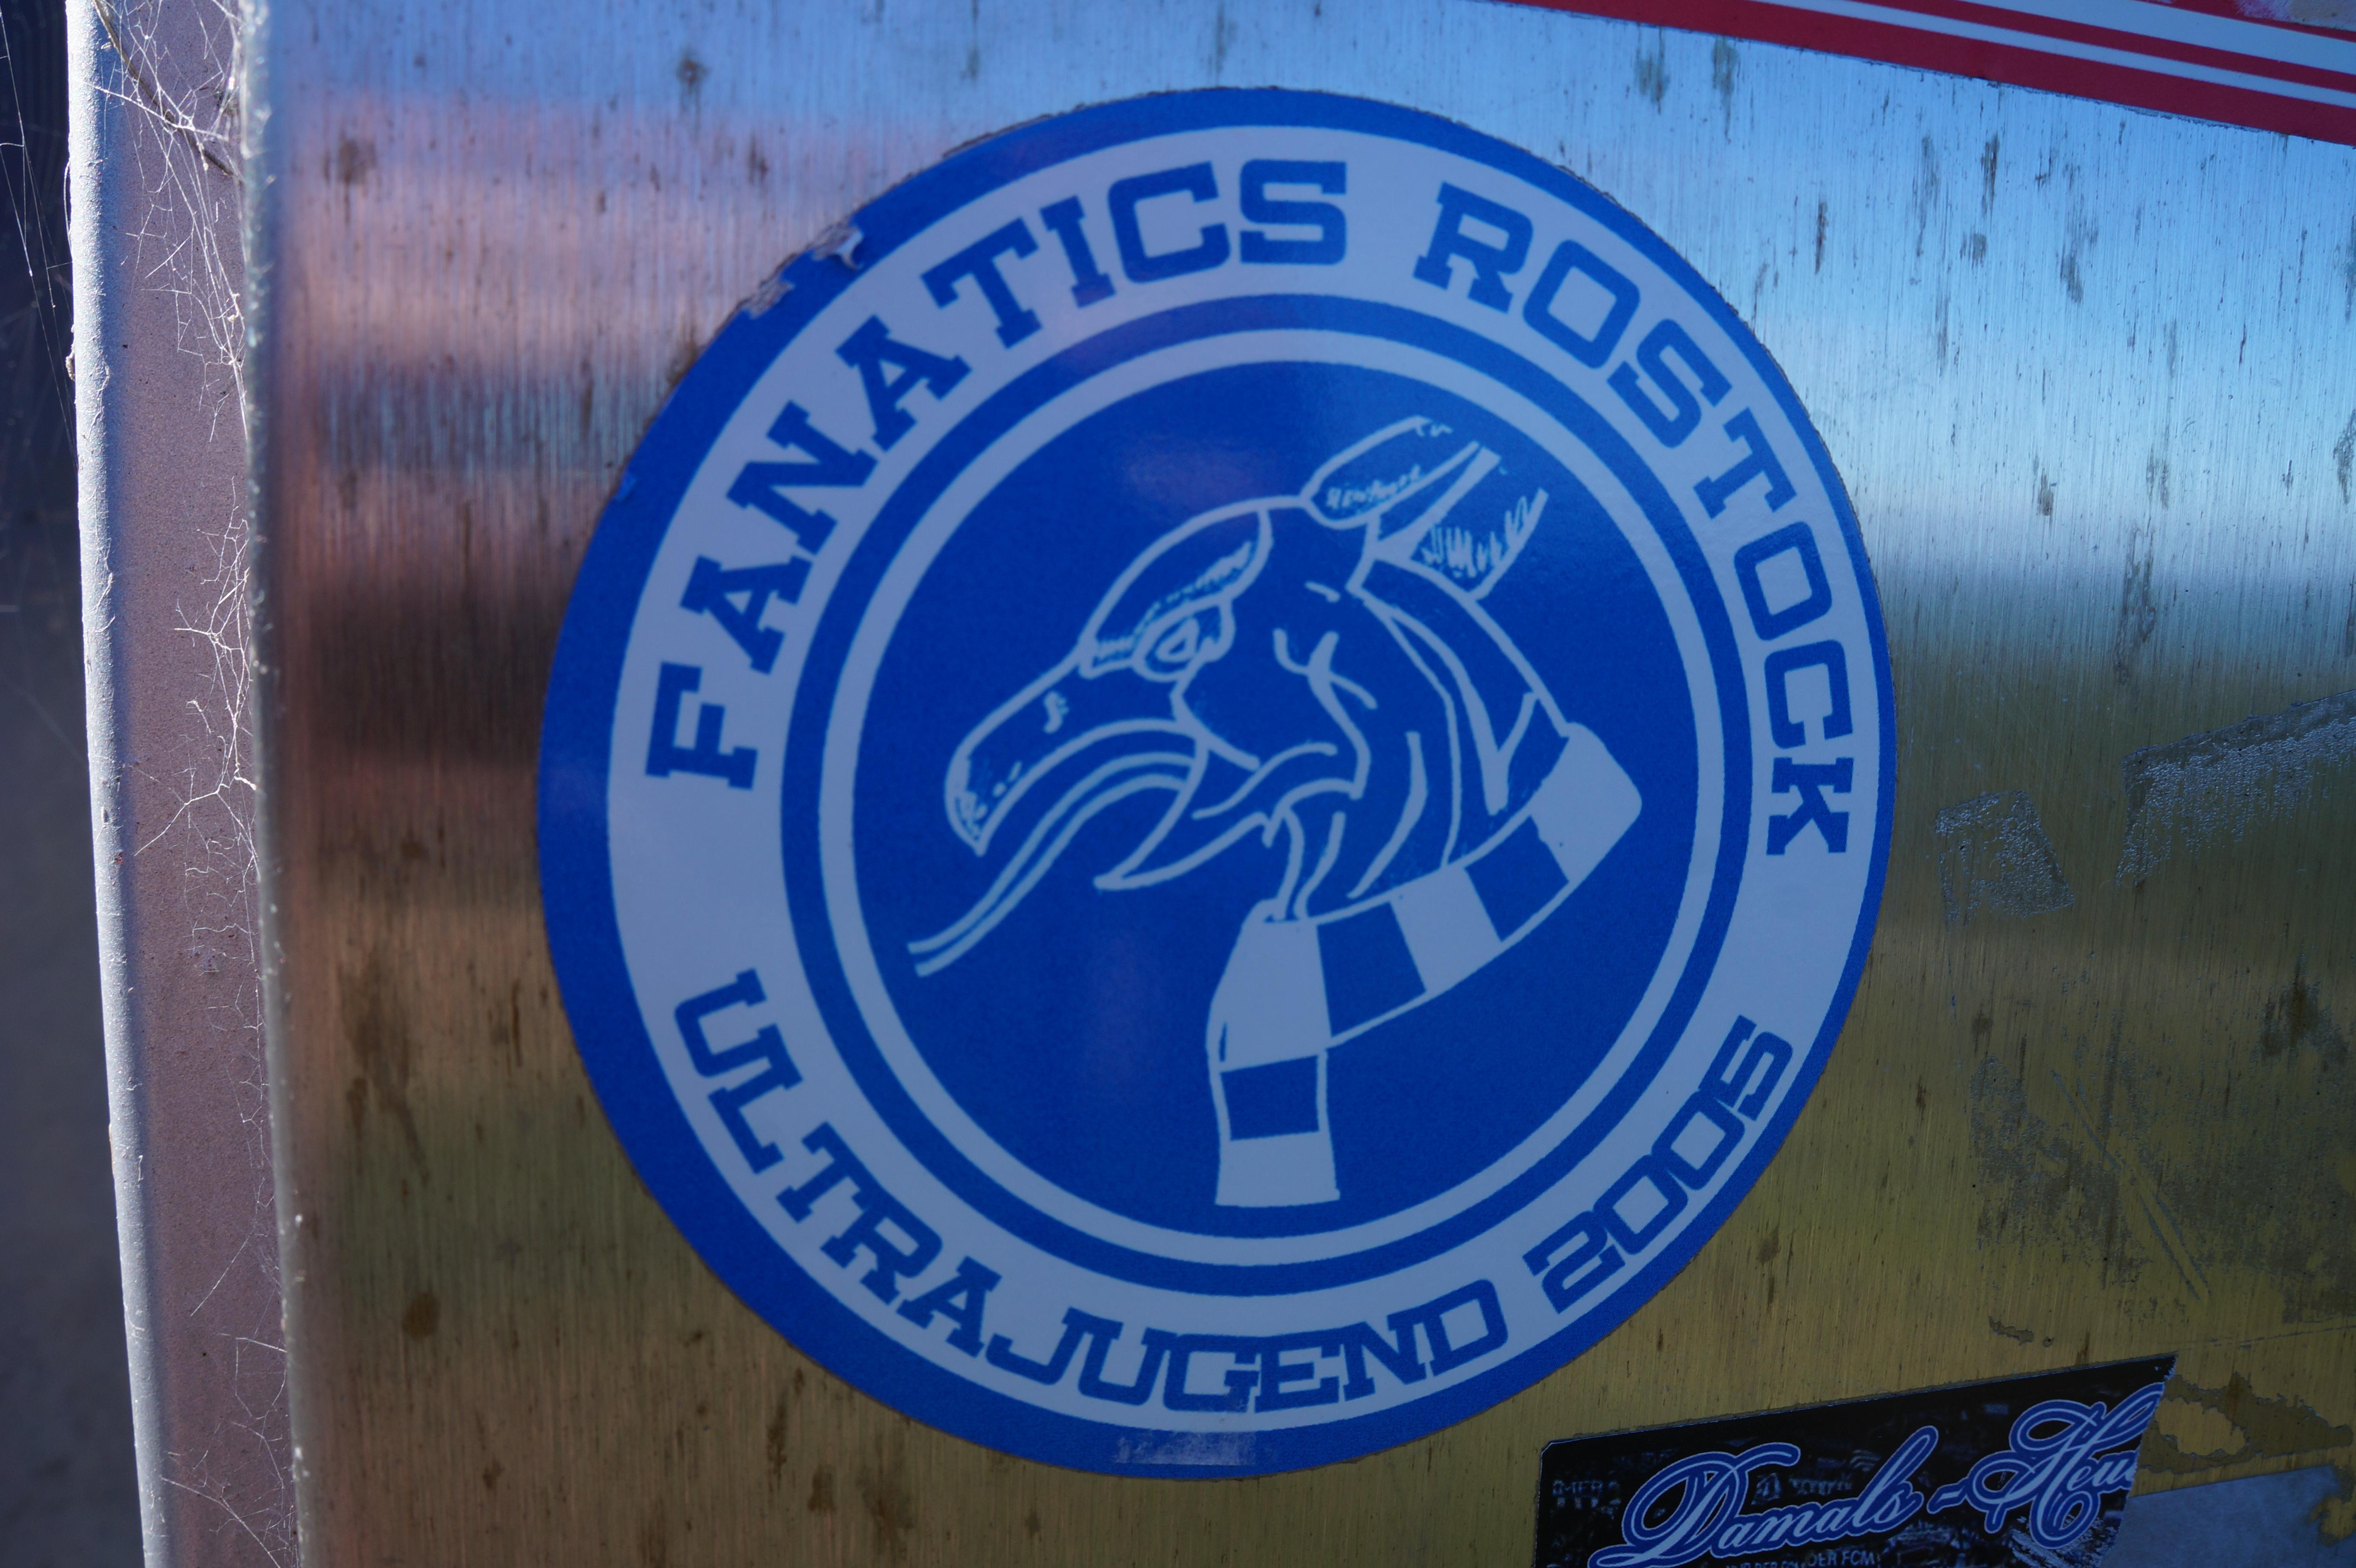 Fanatics Rostock